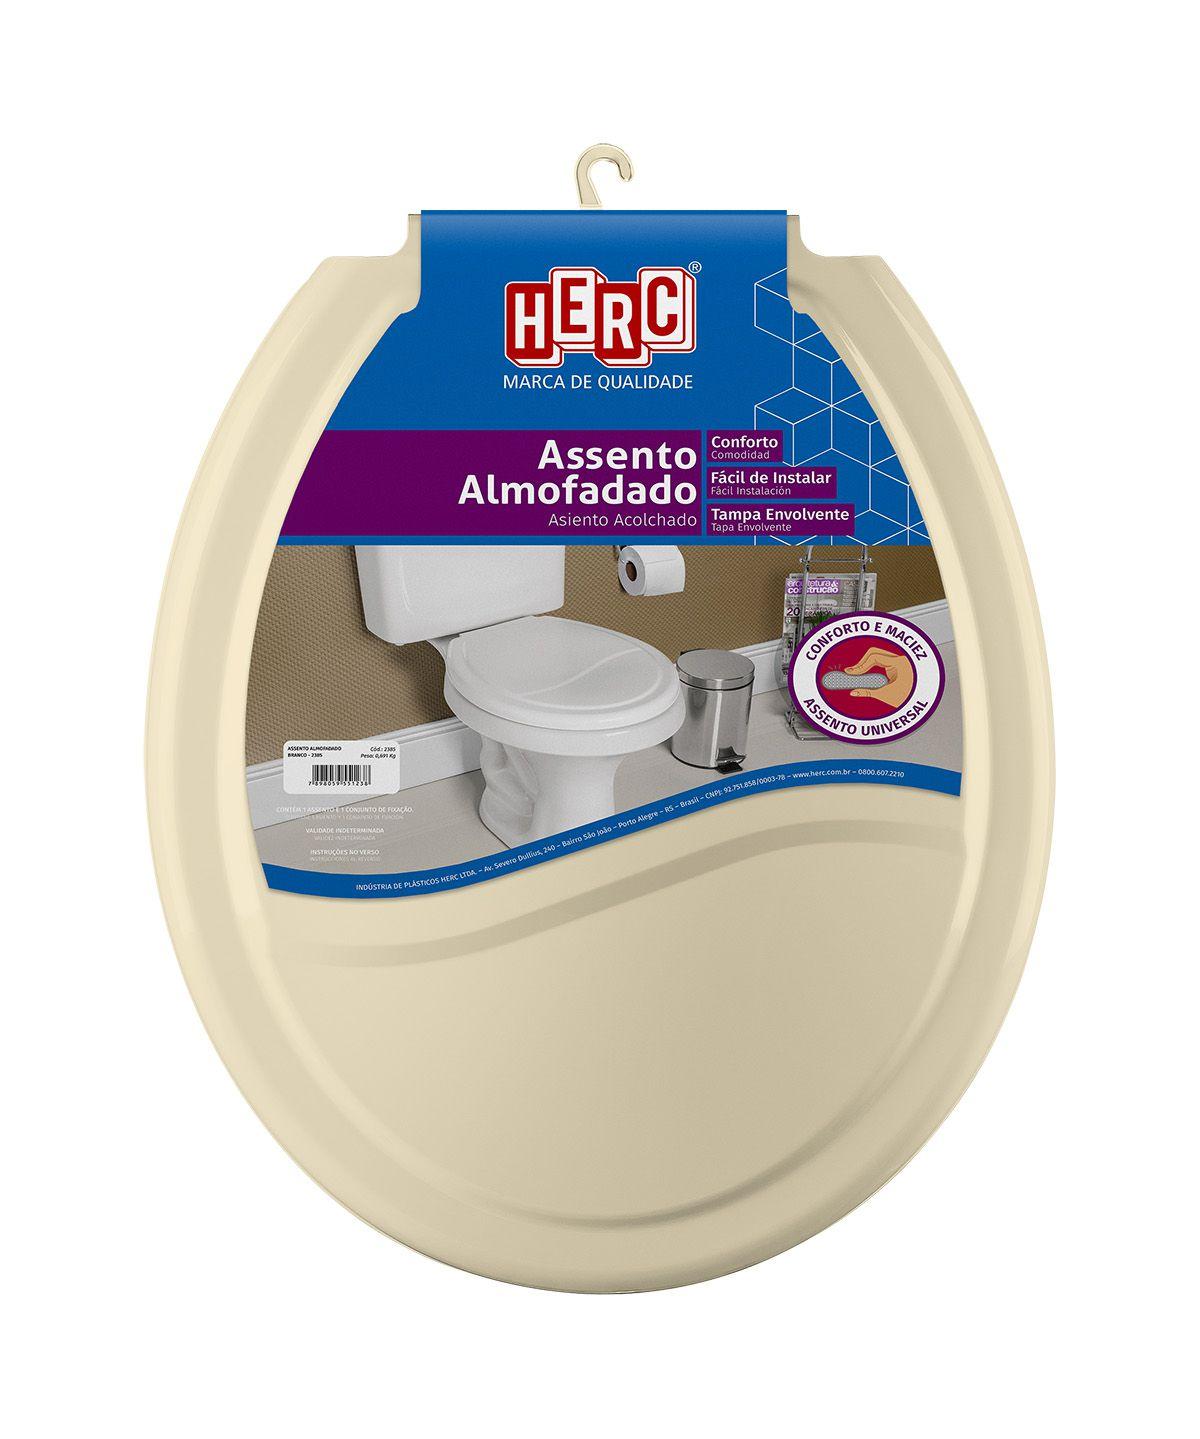 Tampa de Vaso / Assento Sanitário Bege Almofadado 2388 Herc